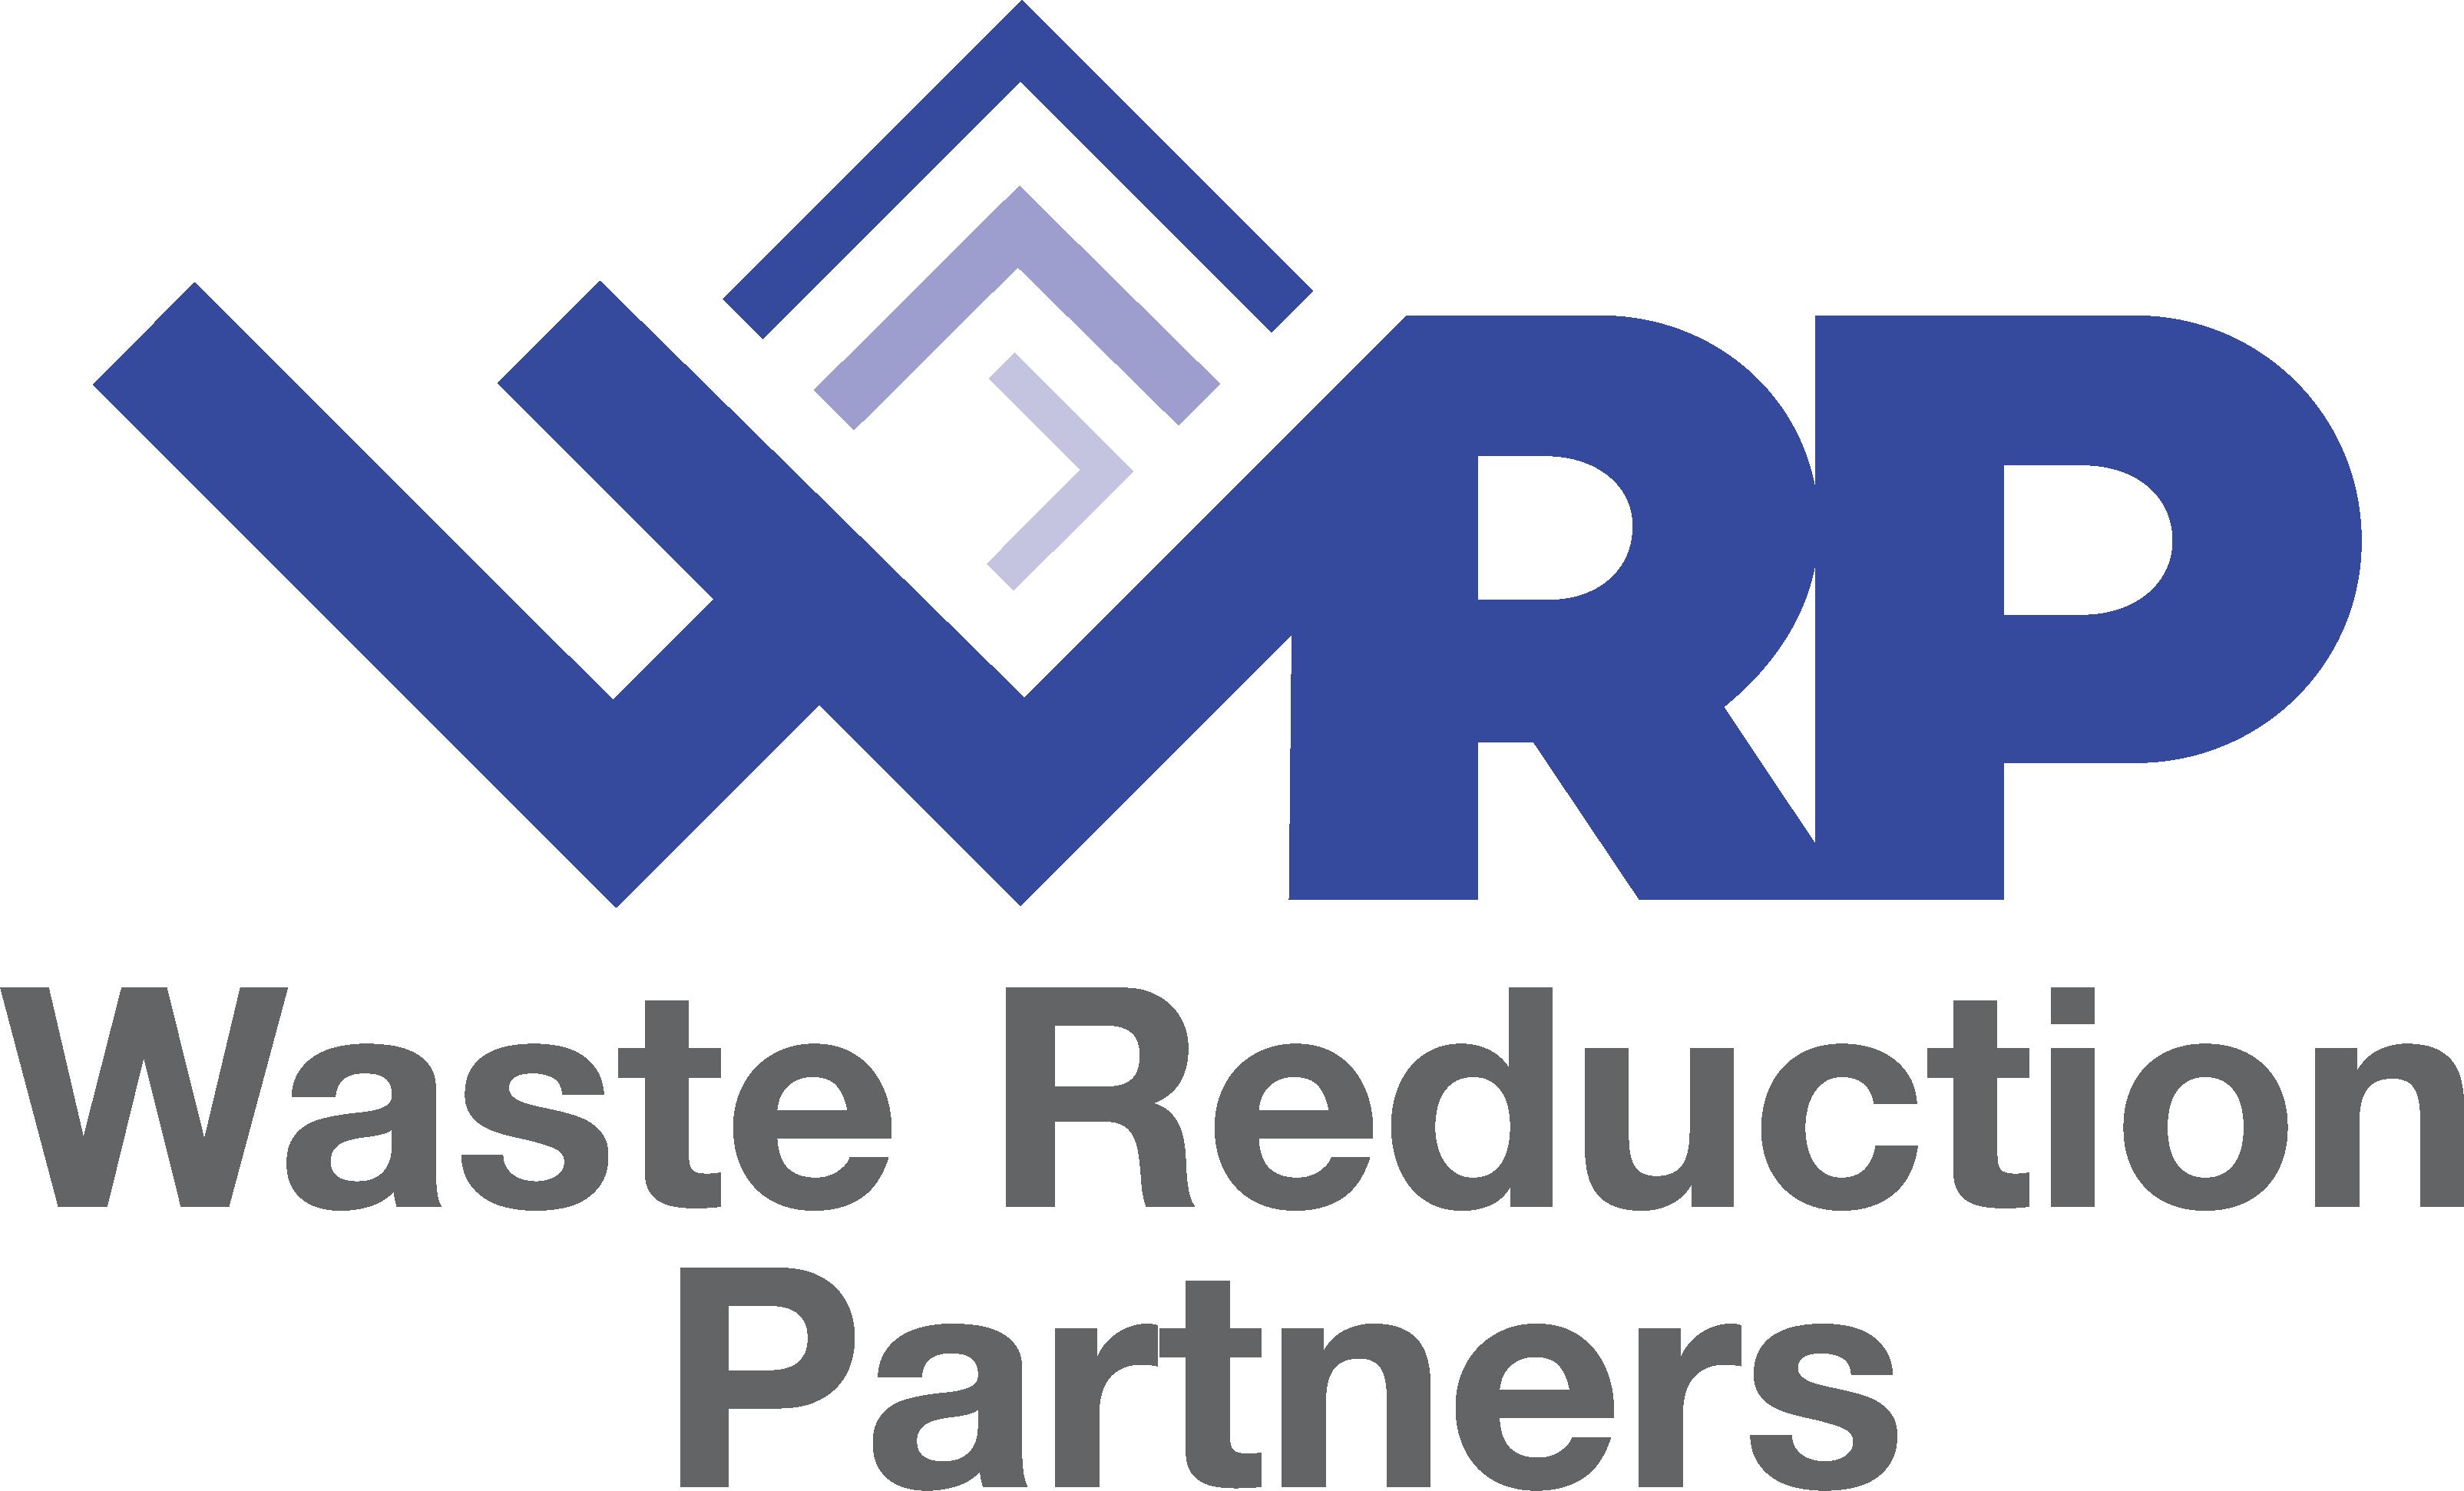 Waste Reductions Partner logo